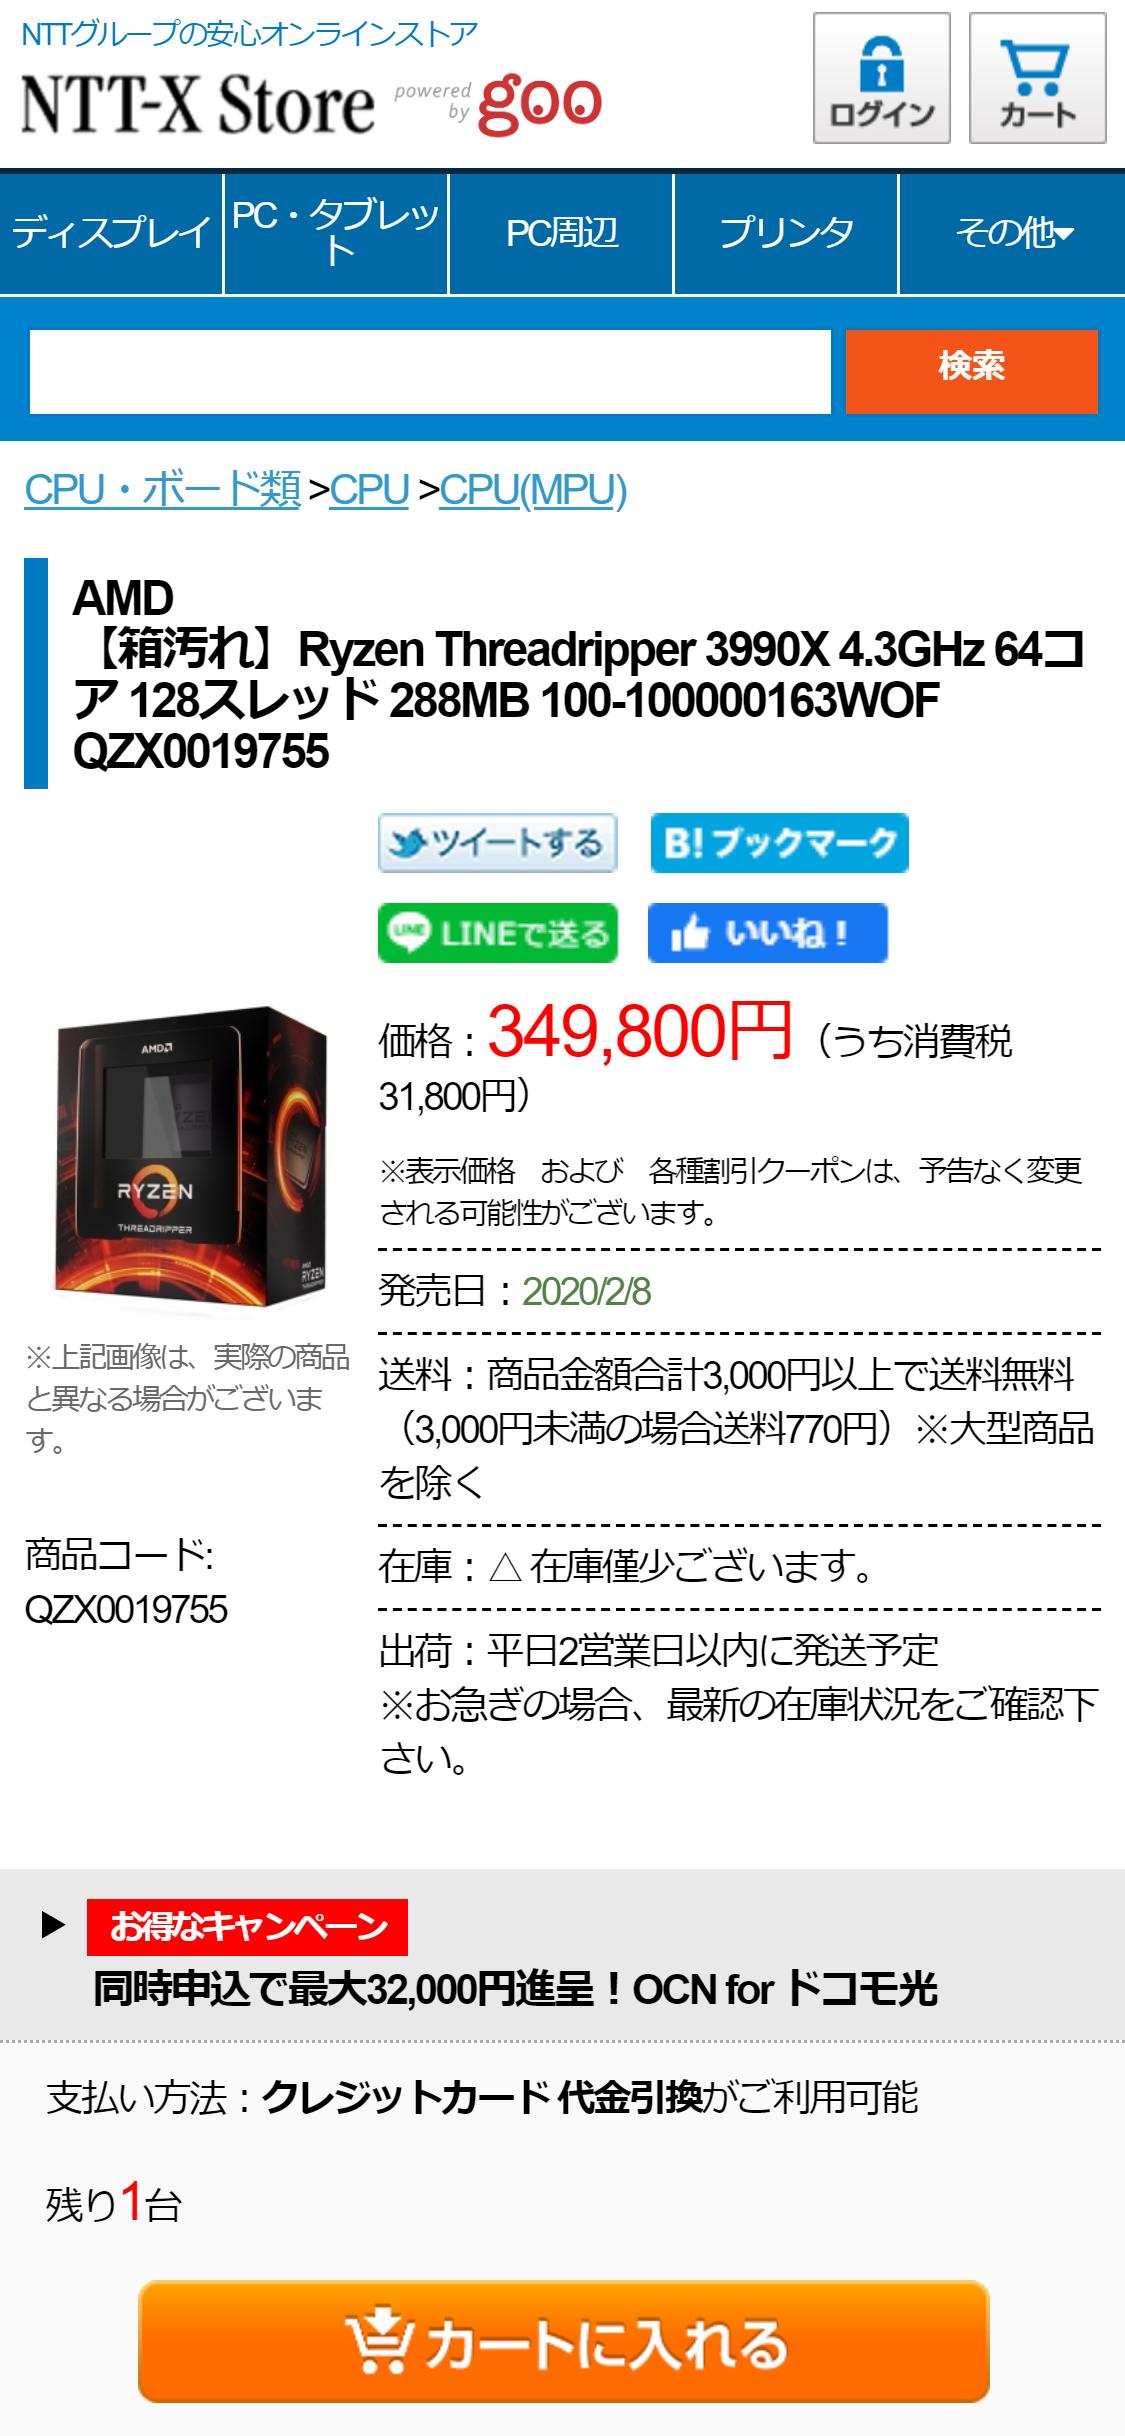 https://gyazo.sunoho.com/i/c3c54d0b1158444154a54b58f3ebb48f